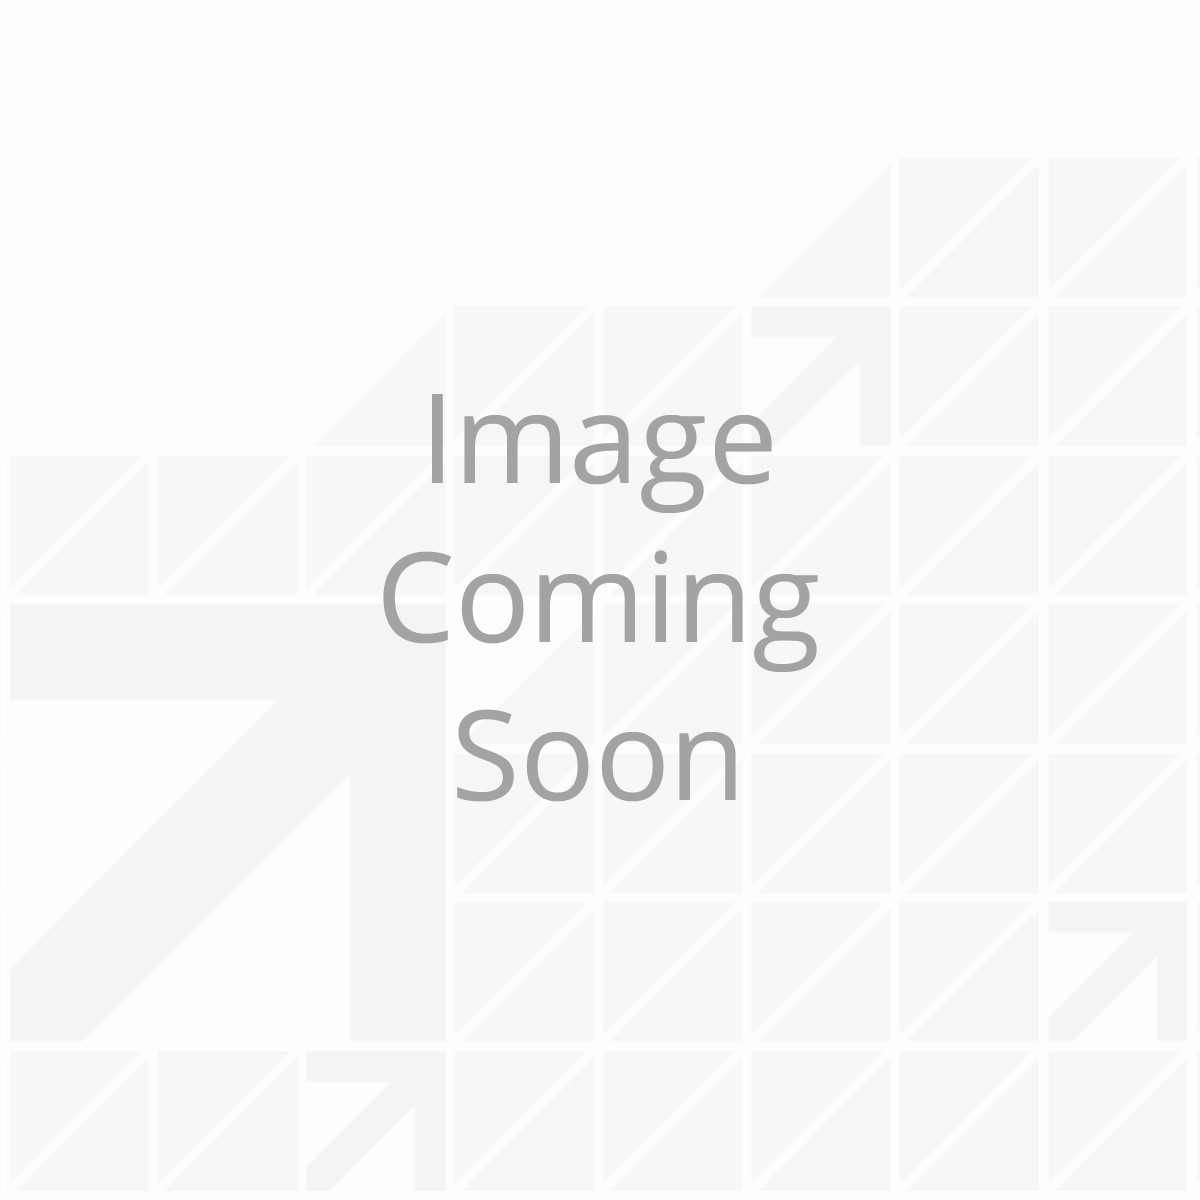 383684_-_observation_monitor_-_001